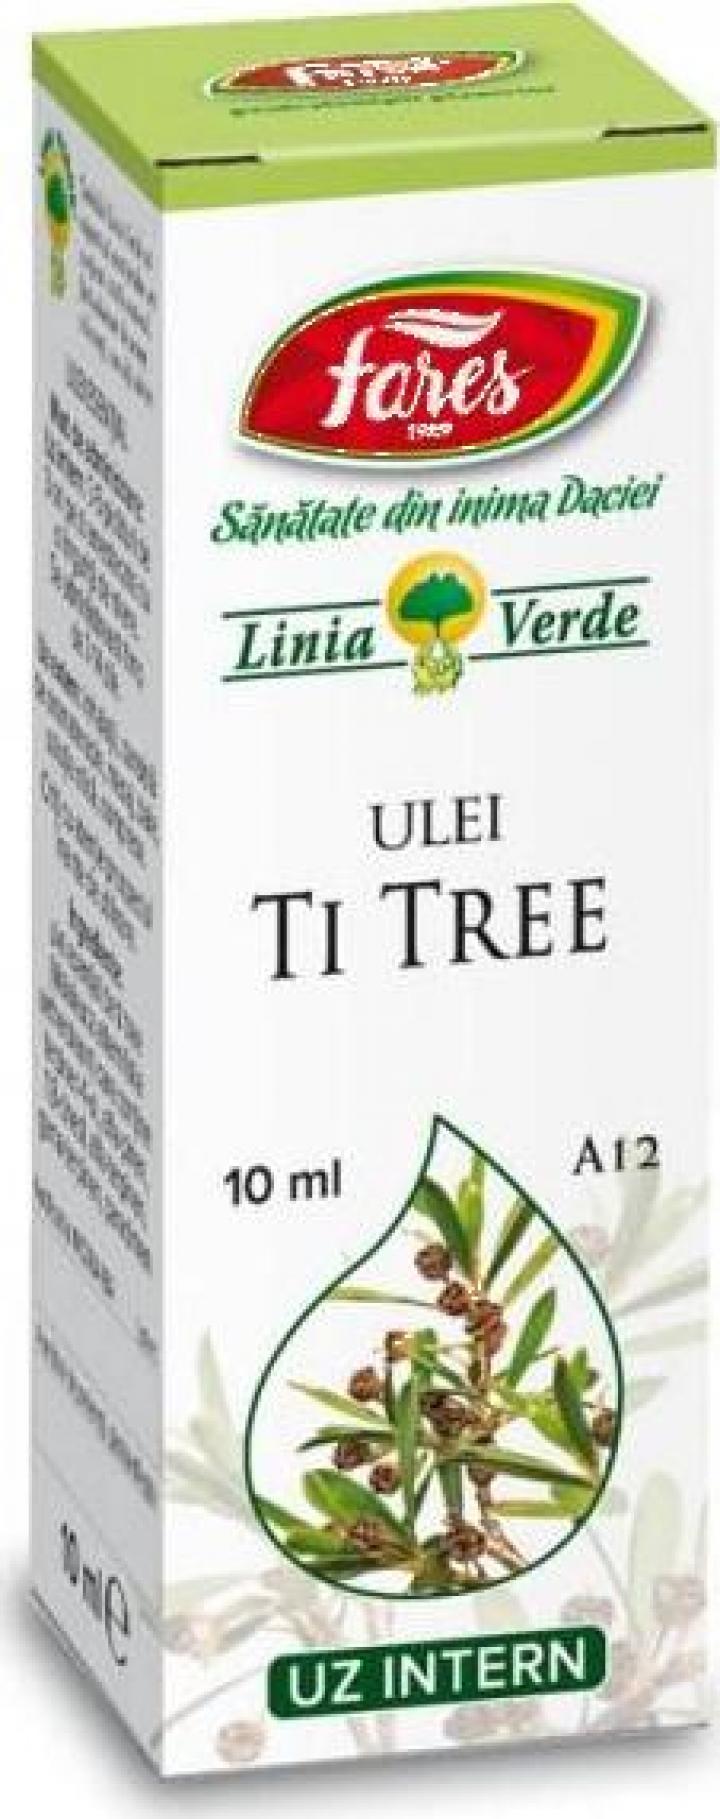 Ulei esential de Ti Tree A12 - 10 ml Fares